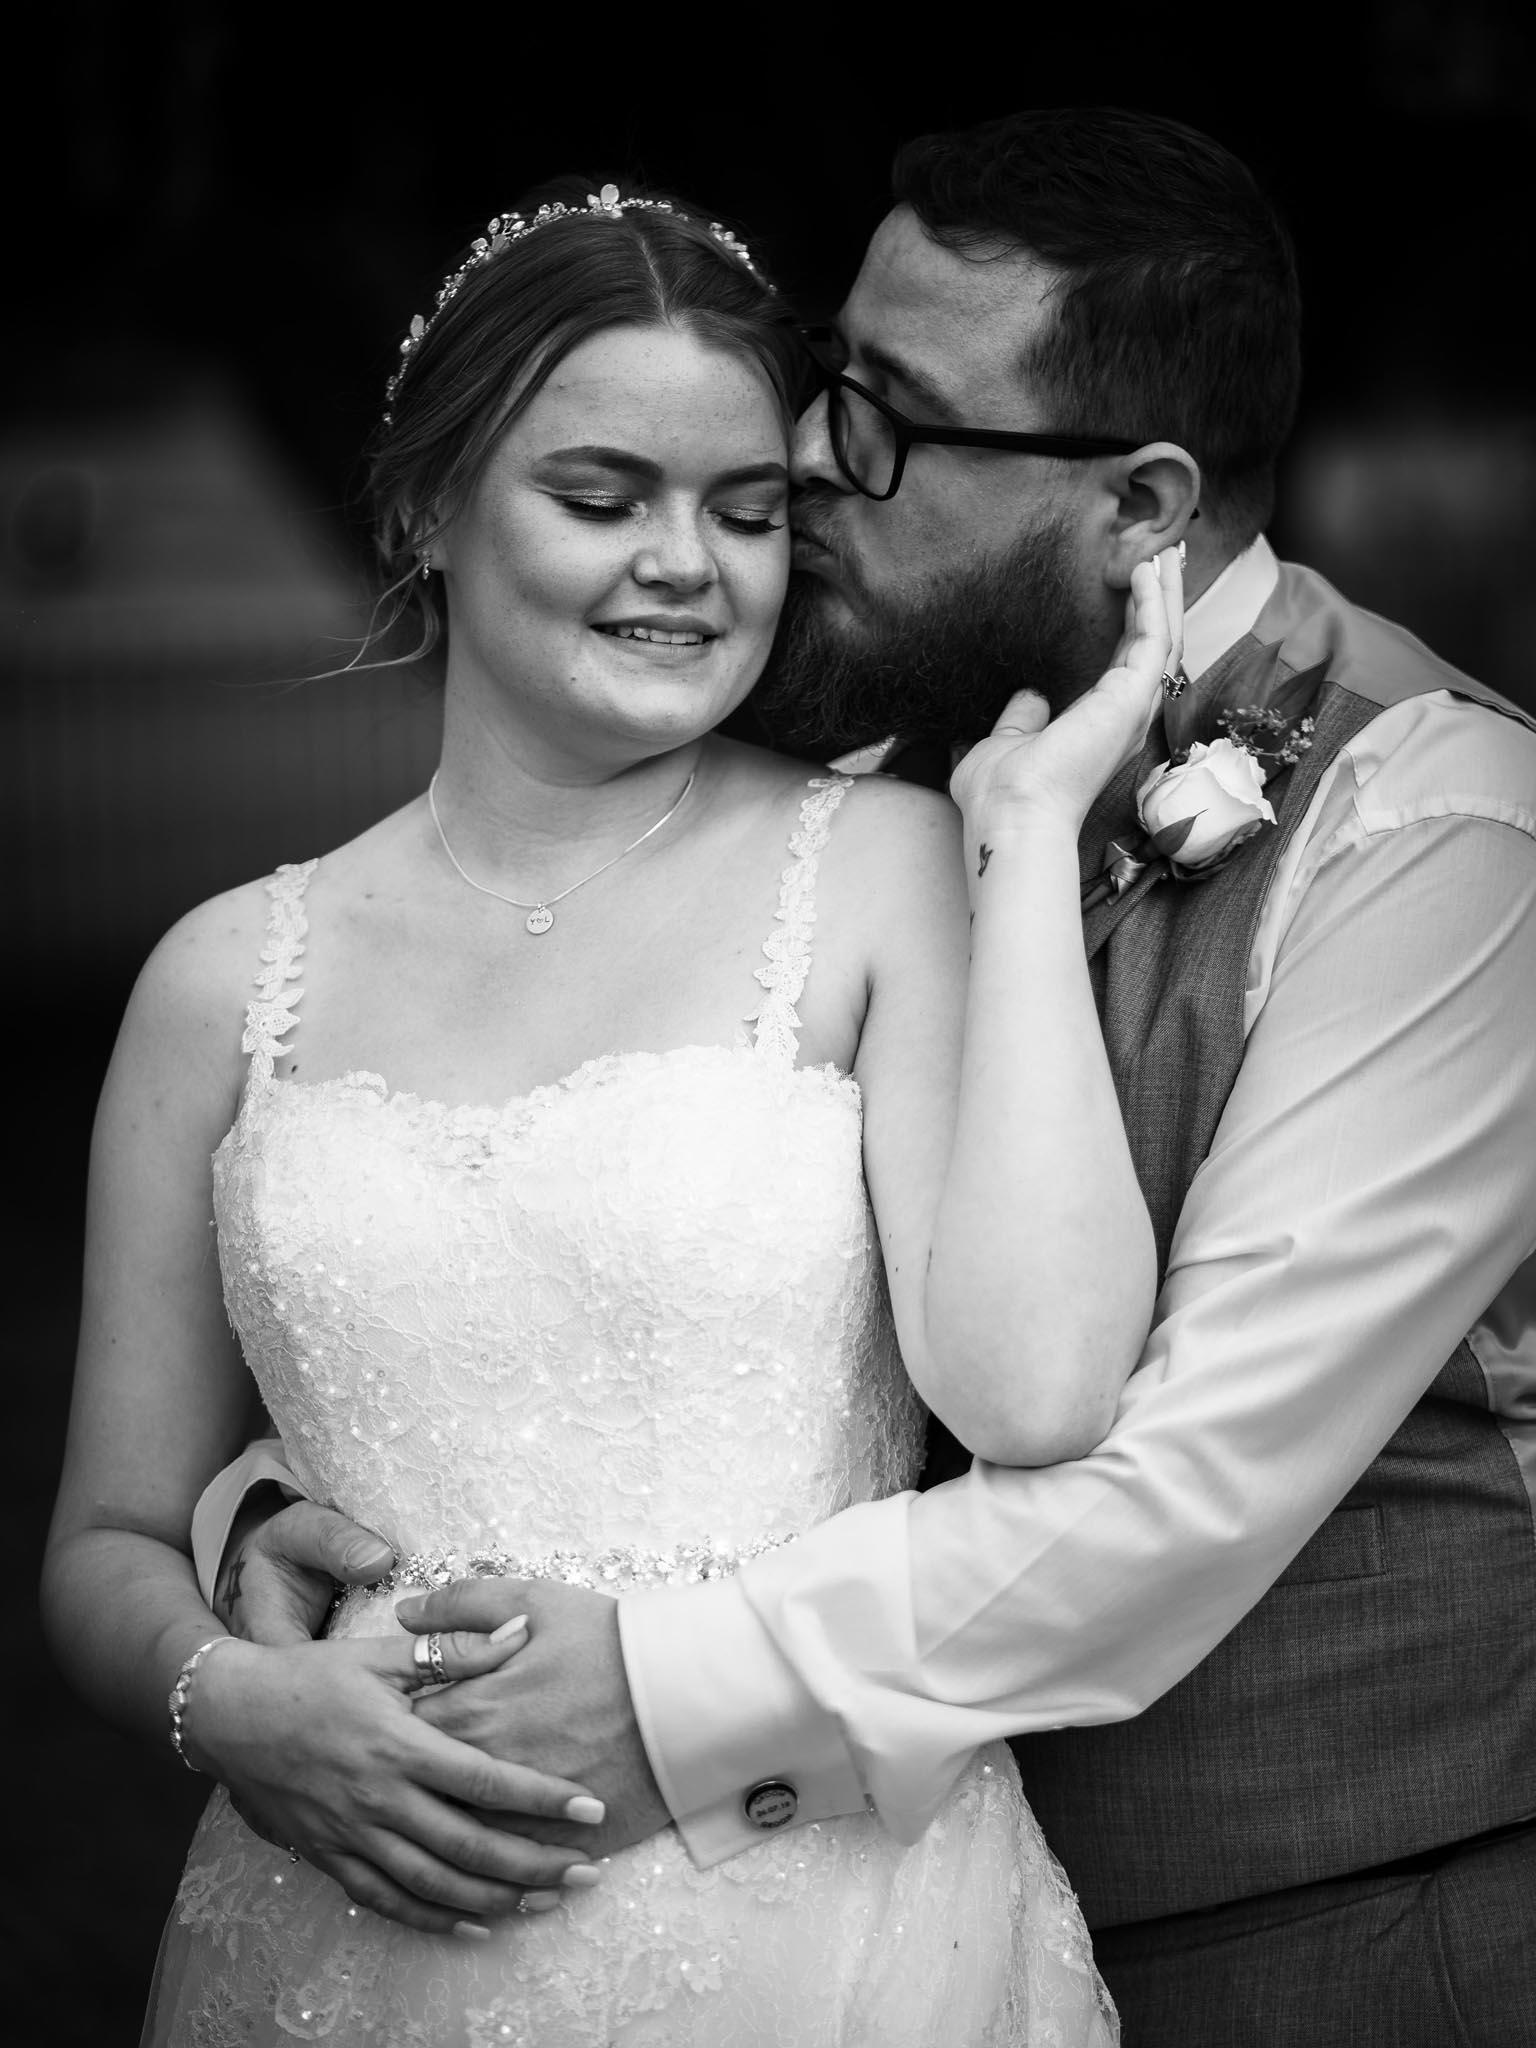 566-Bride-groom-Luke-Yasmin-The-Rayleigh-Club-Wedding-Photography.jpg